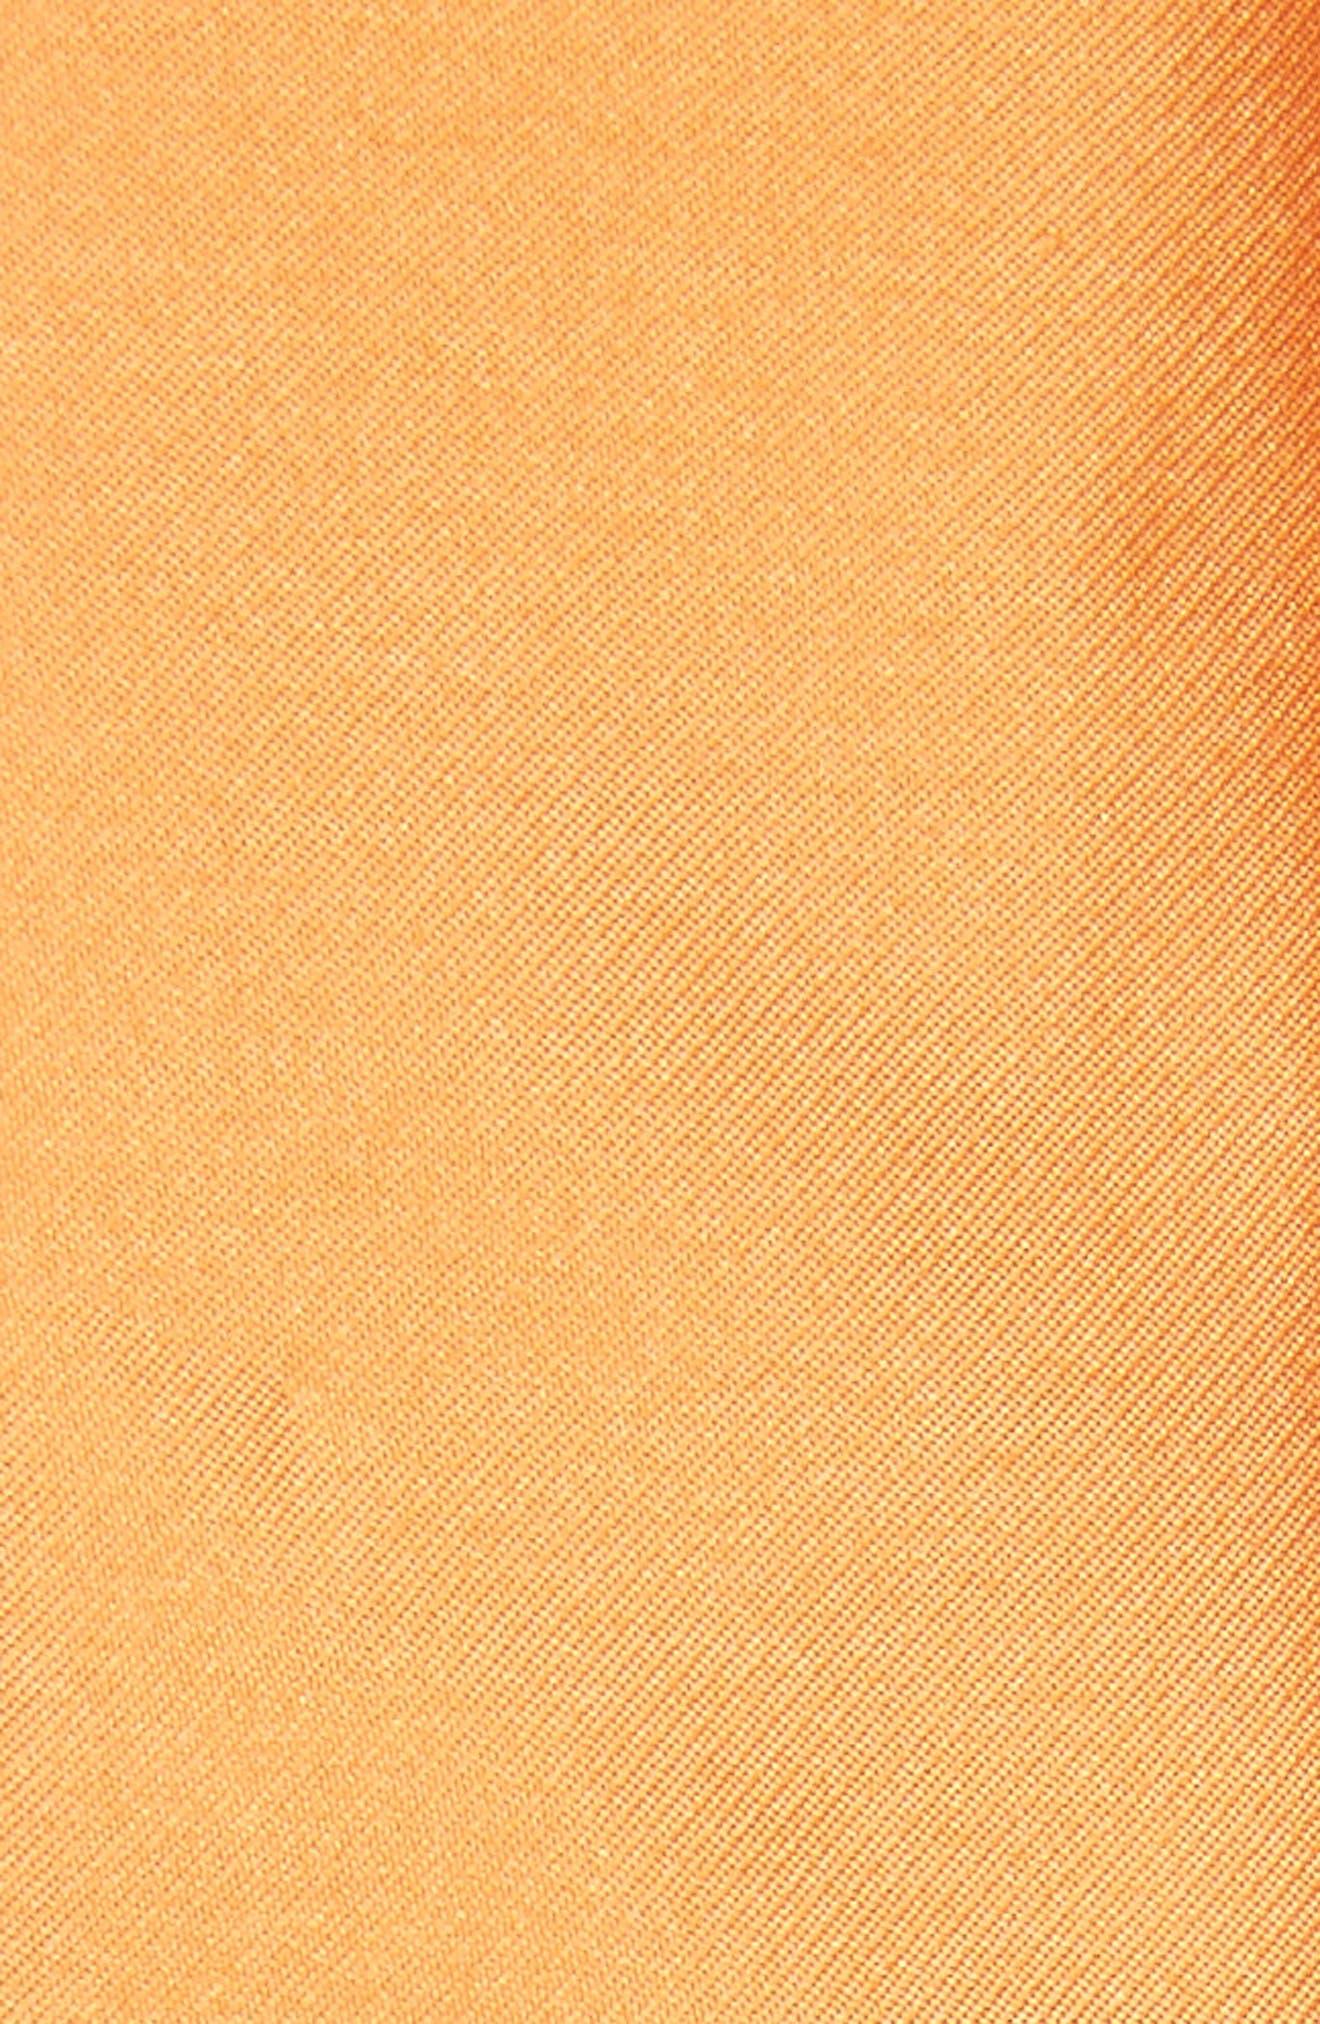 Alternate Image 5  - Sachin & Babi Noir Marmara Ballgown